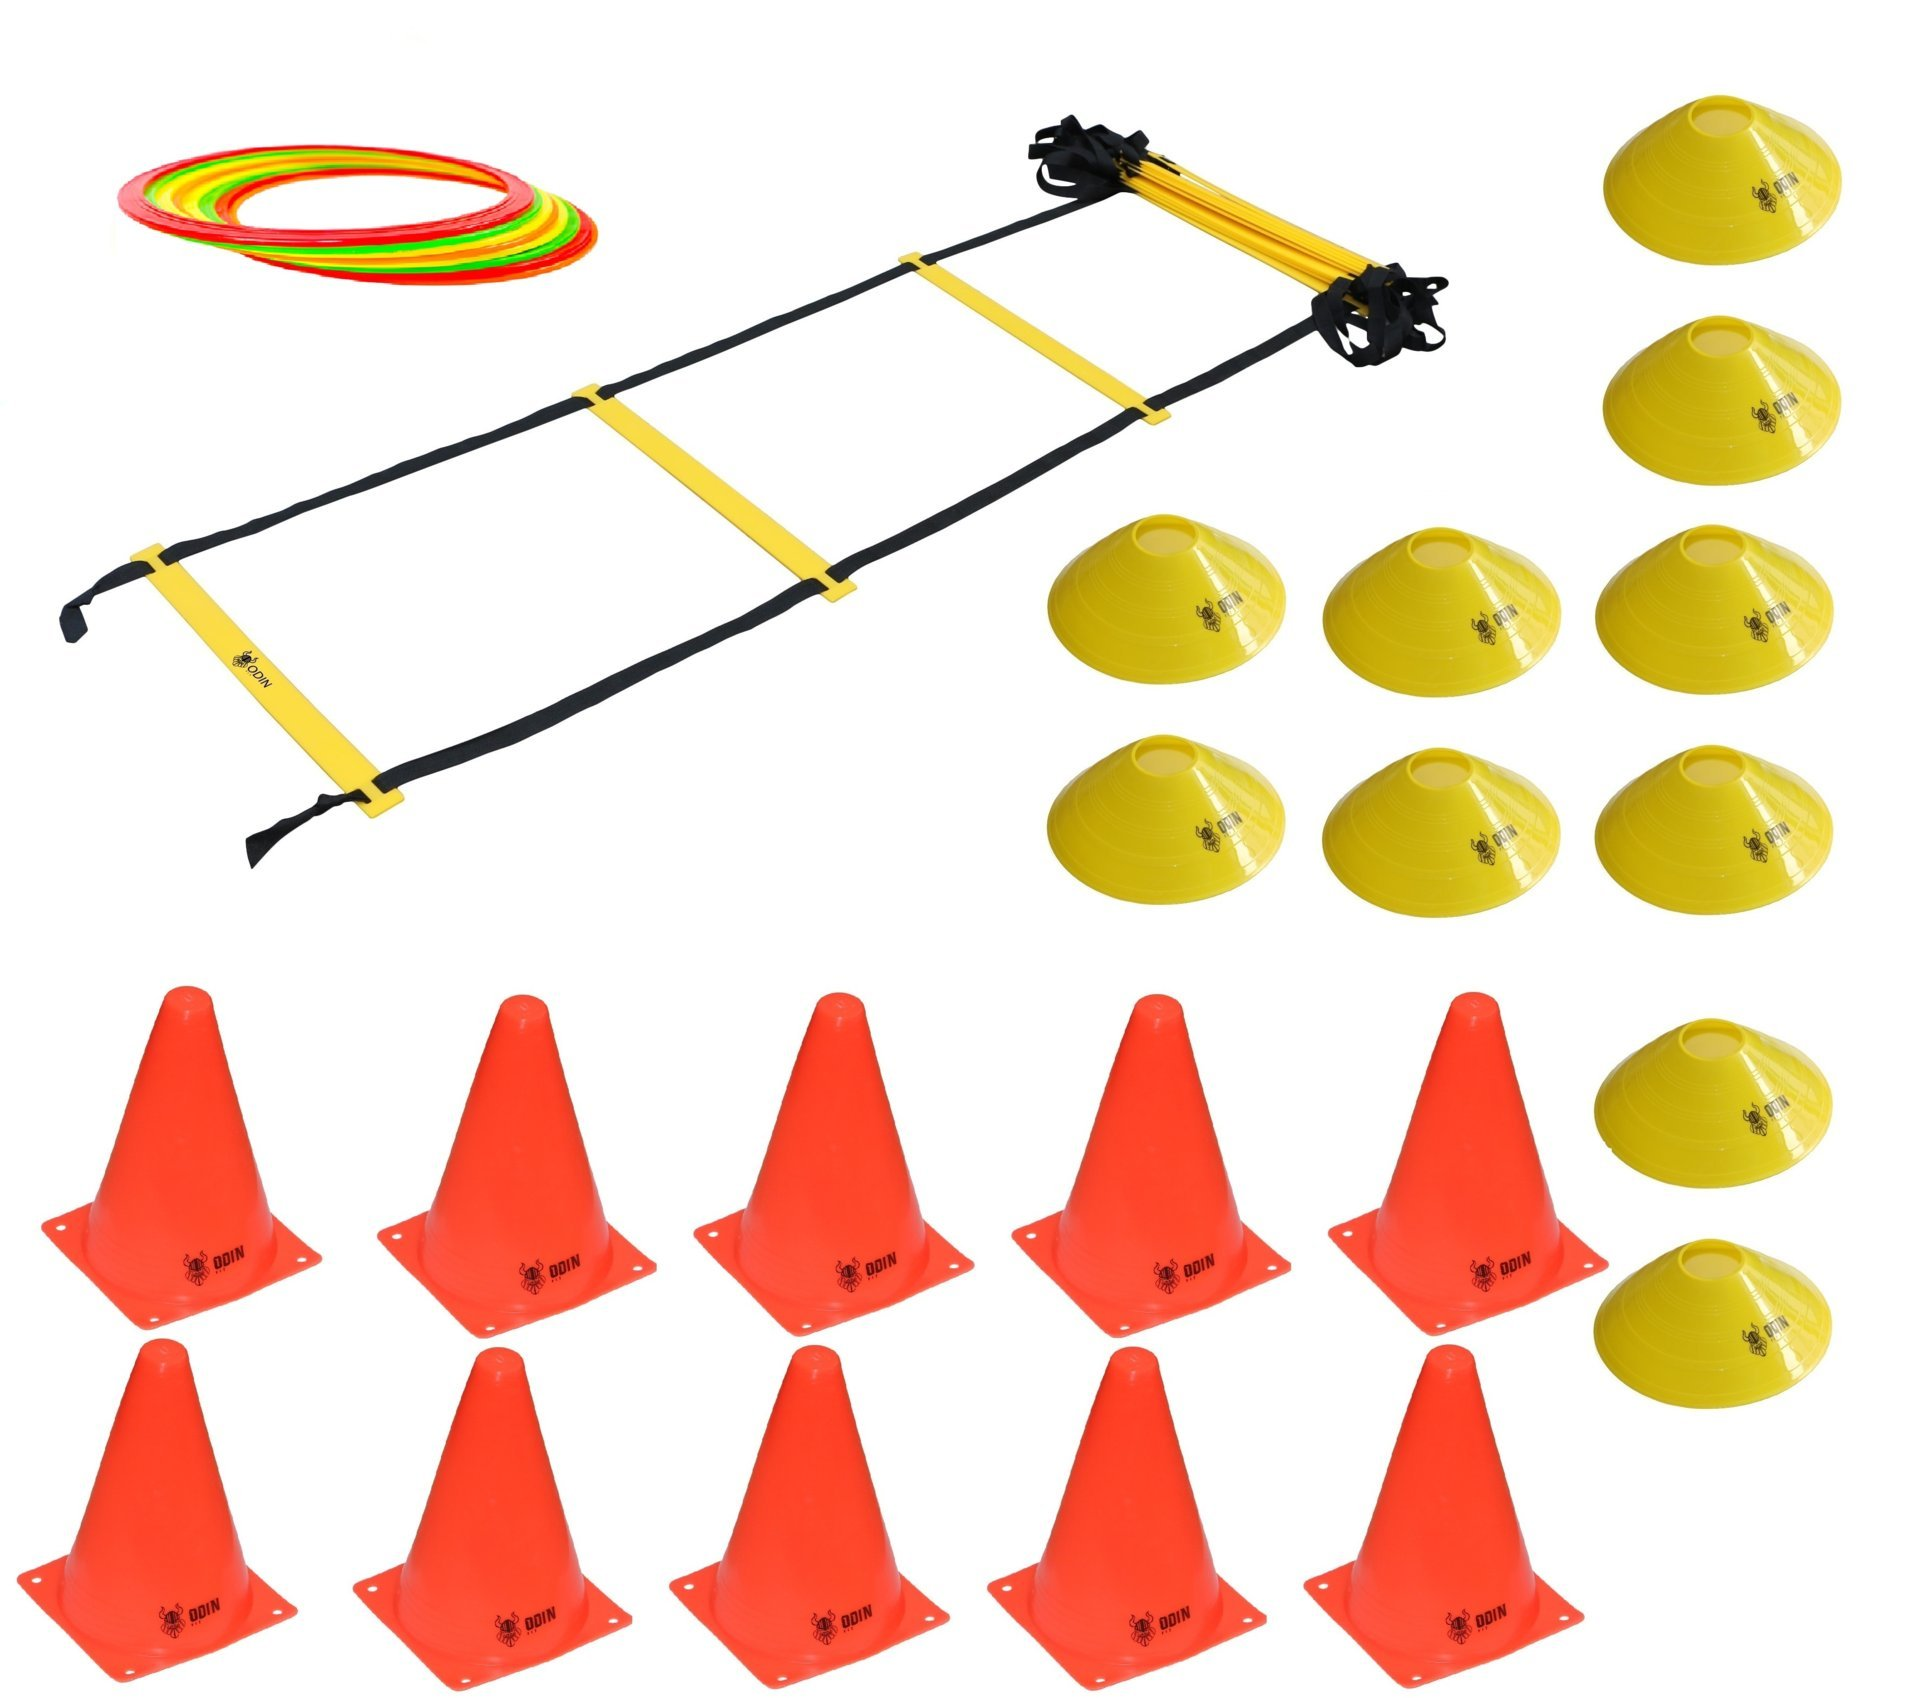 Kit Treinamento Funcional Escada de Agilidade 12 Argolas de Agilidade 10 Cones 10 Chapéu Chinês